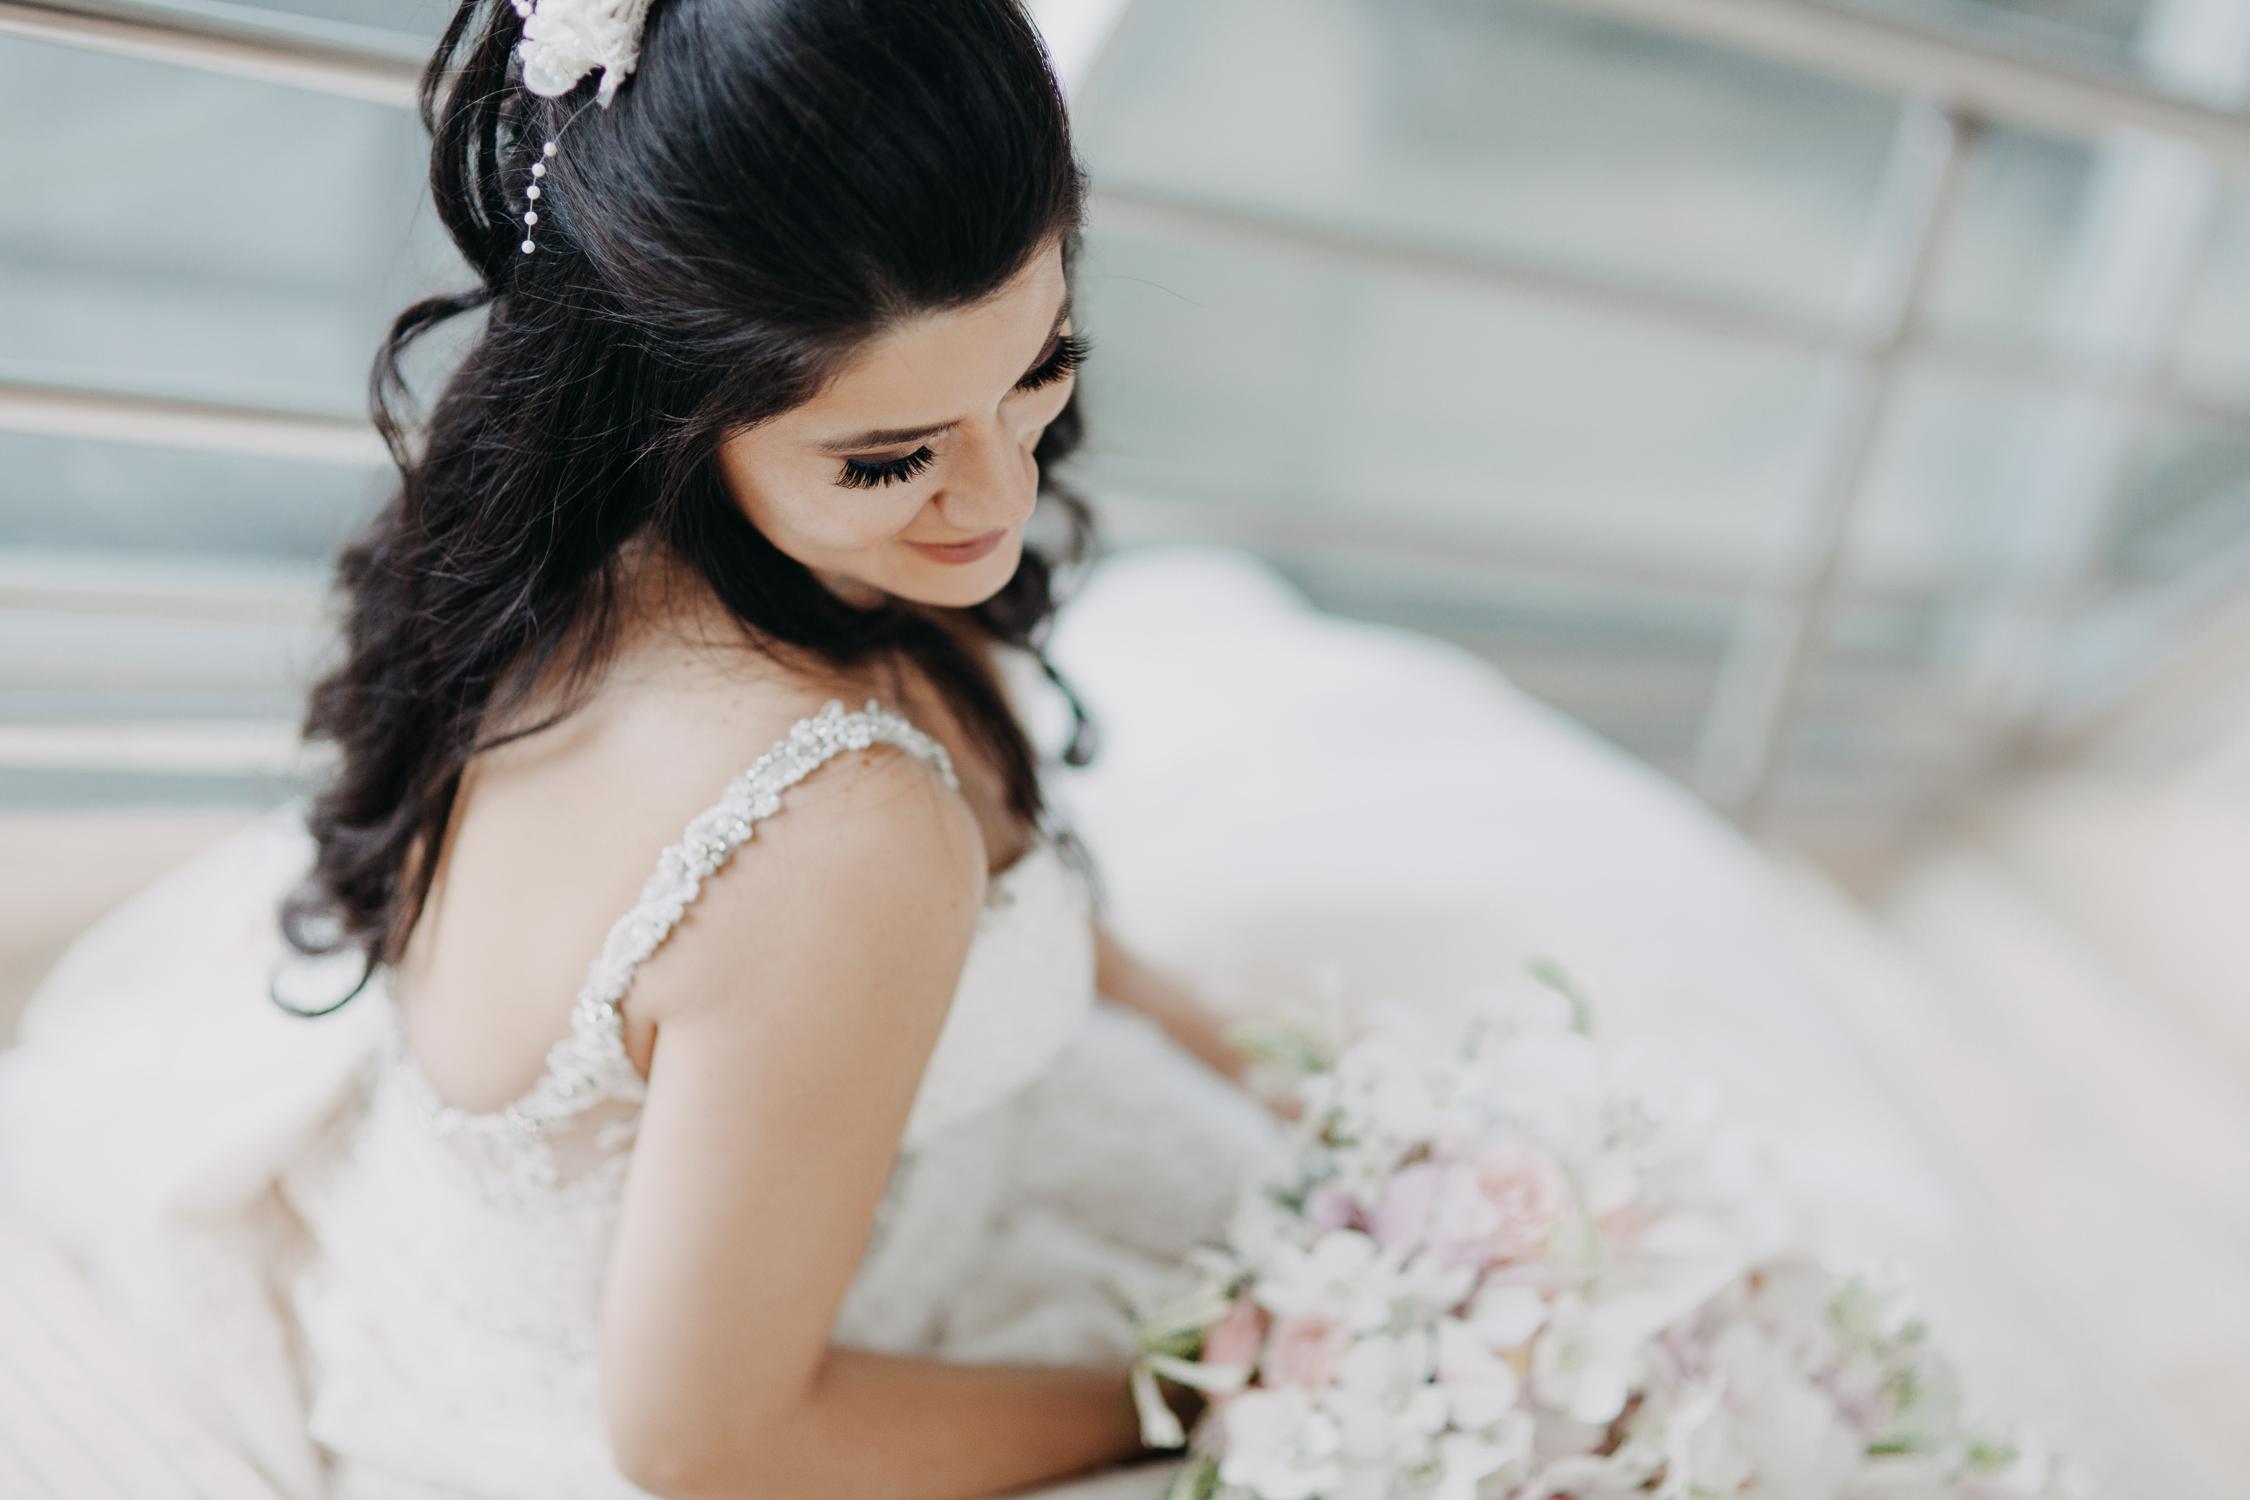 Michelle-Agurto-Fotografia-Bodas-Ecuador-Destination-Wedding-Photographer-Daniela-Dirk-88.JPG